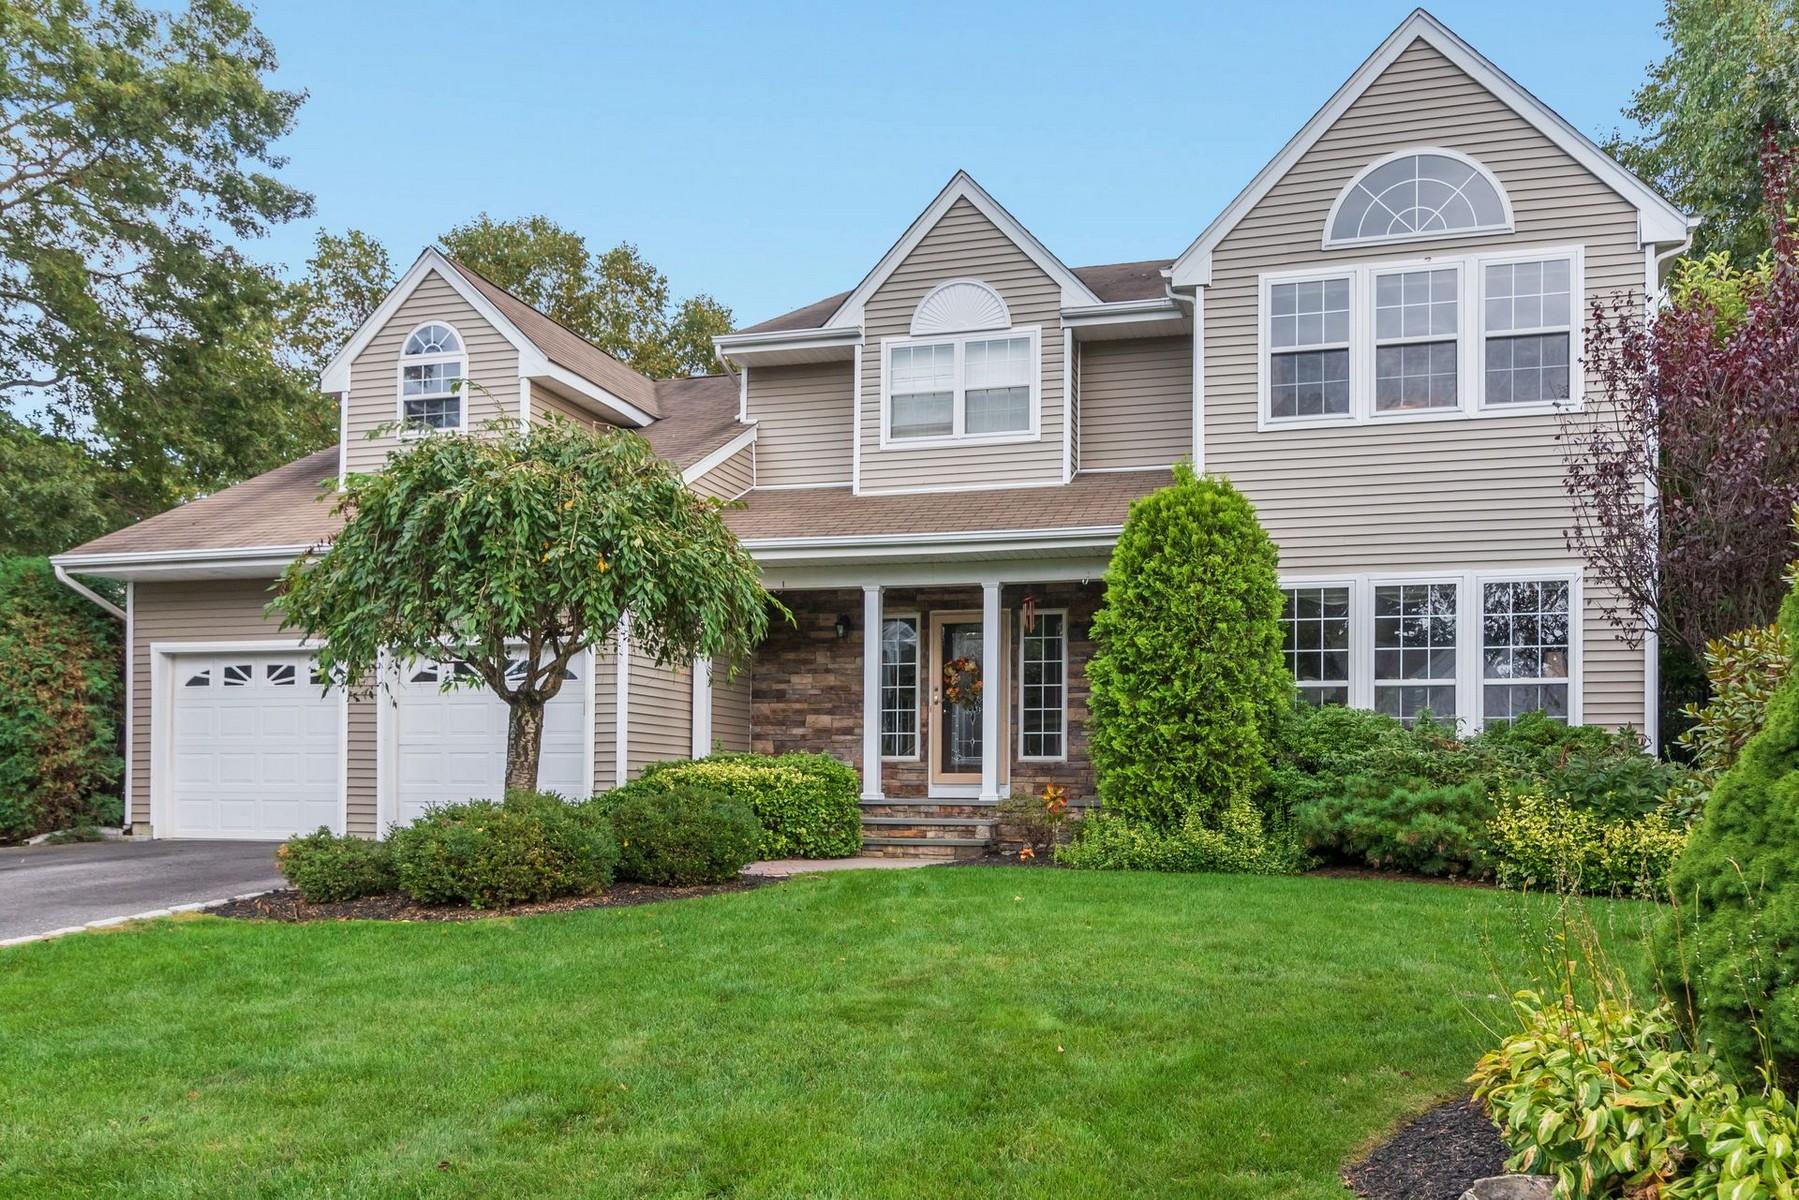 Single Family Homes for Sale at S. Setauket 8 Hancock Ct Centereach, New York 11720 United States